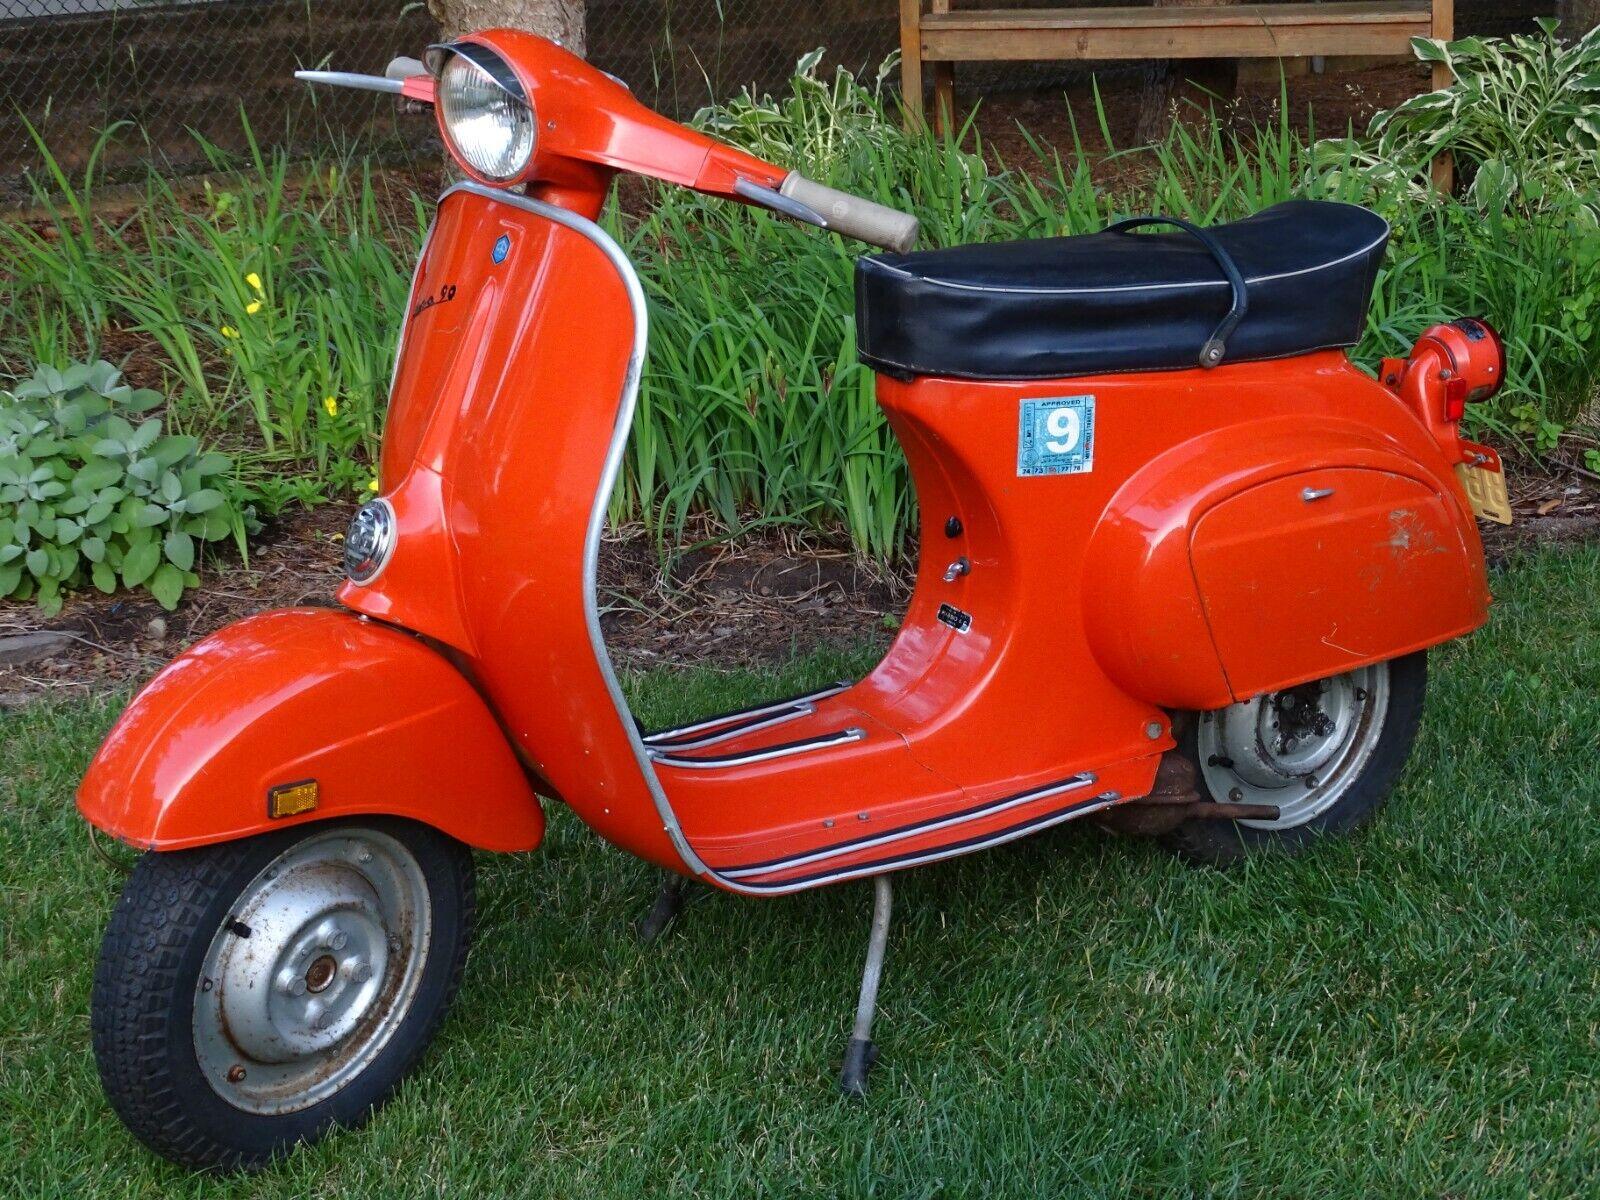 Garage Find:1971 Vespa 90 Scooter, Stored 44 Years, Running,1407 Original Miles!